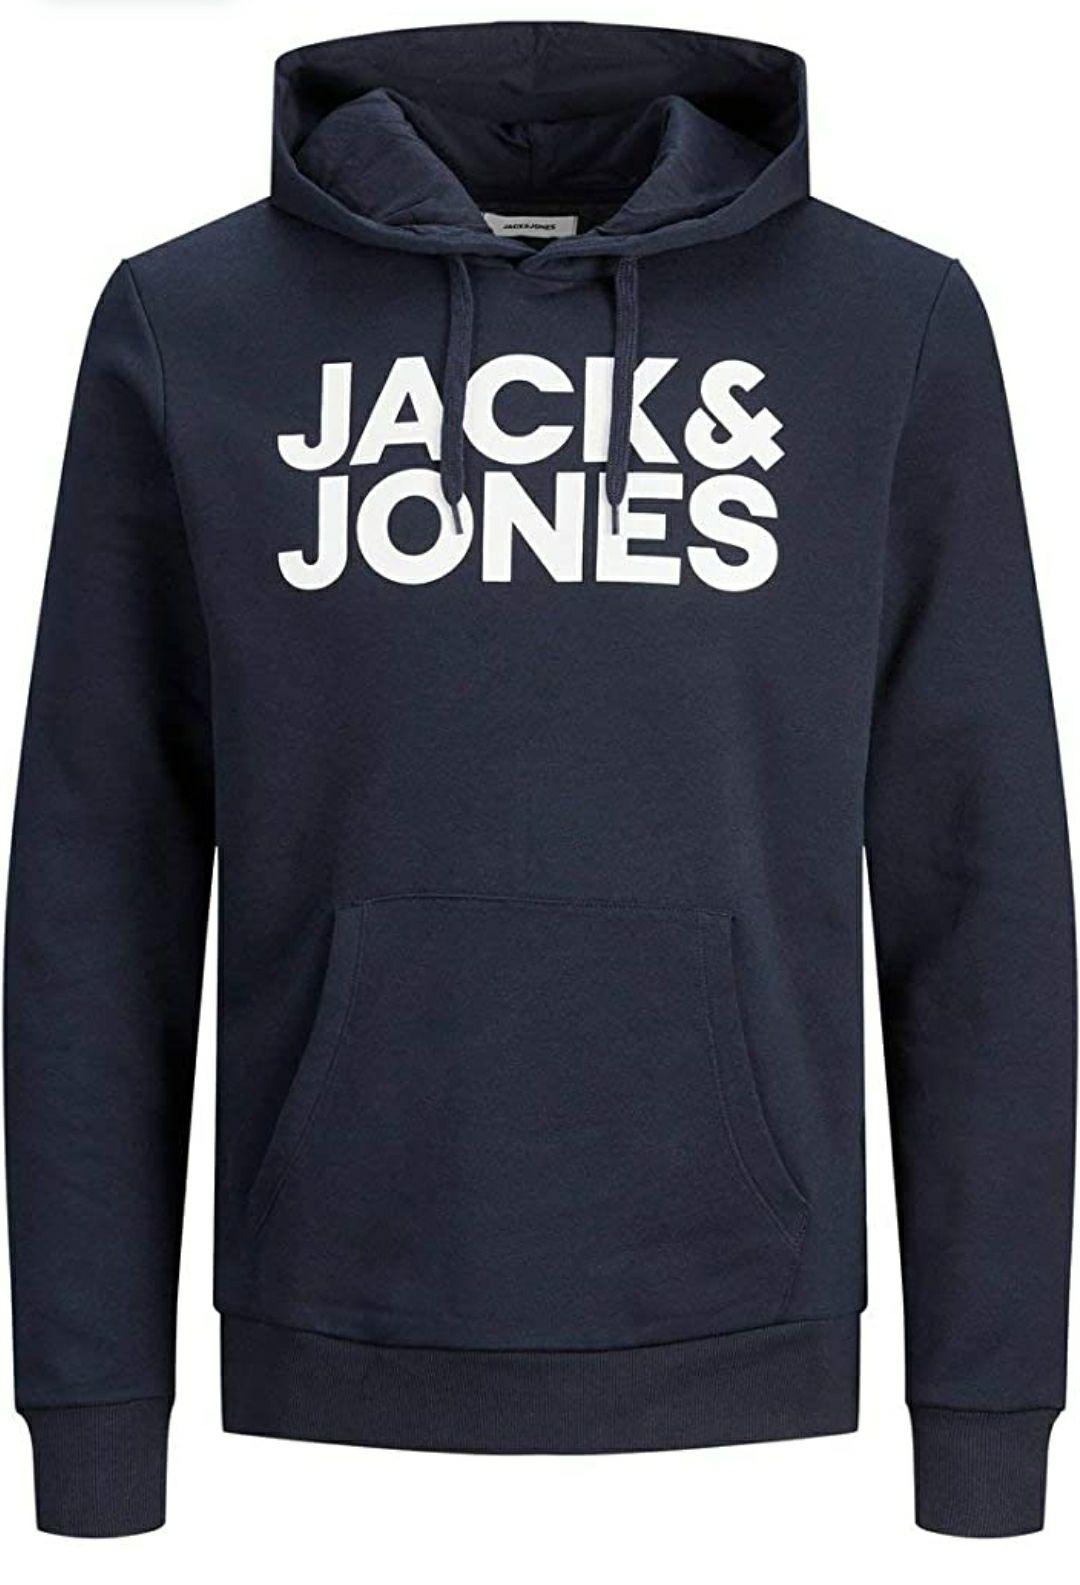 Sudadera con capucha Jack & Jones talla M